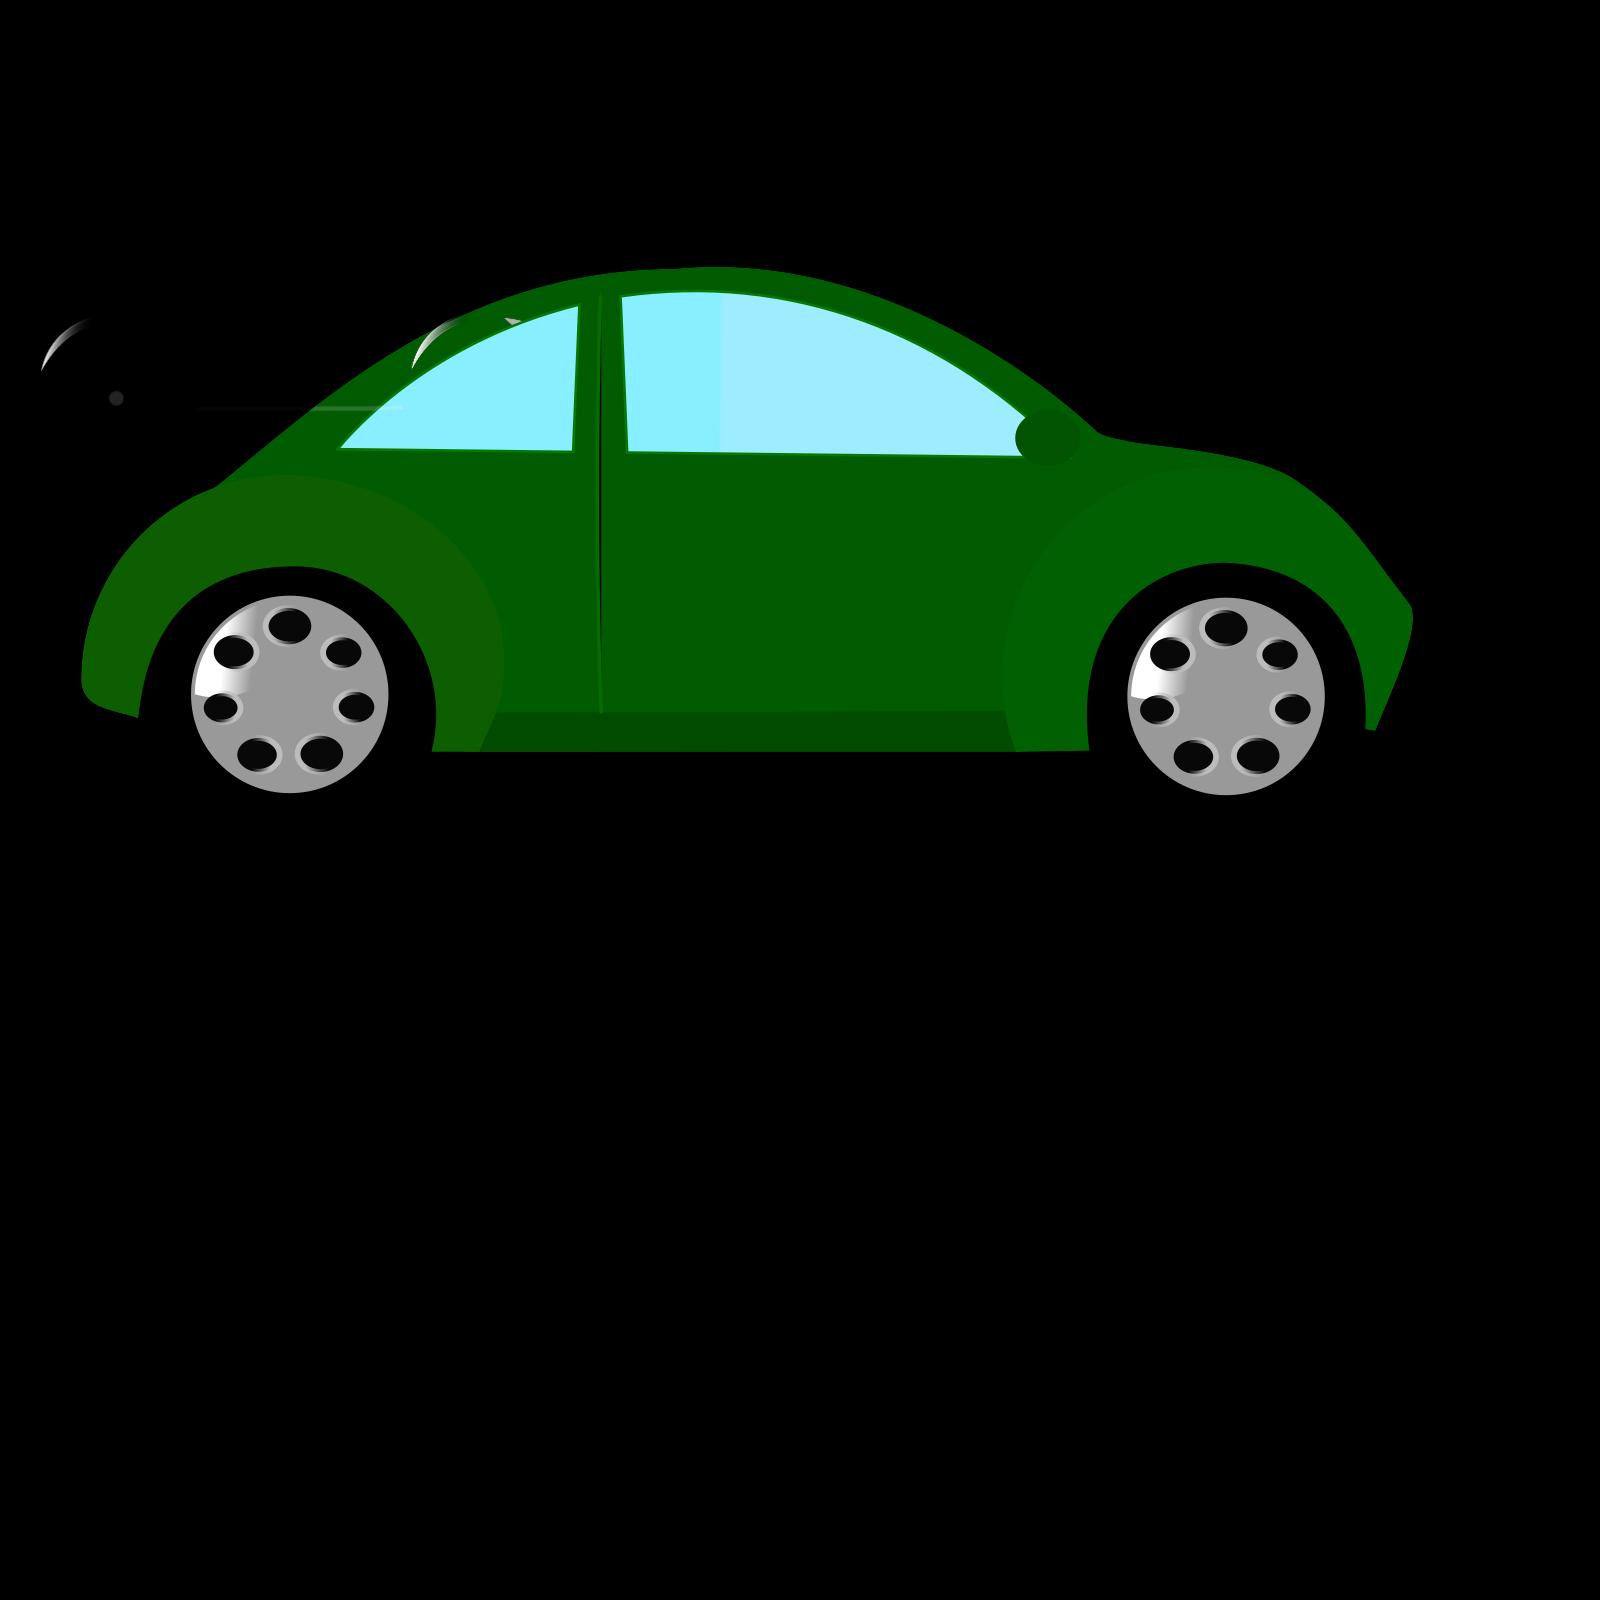 Car green. Dark clip art icon